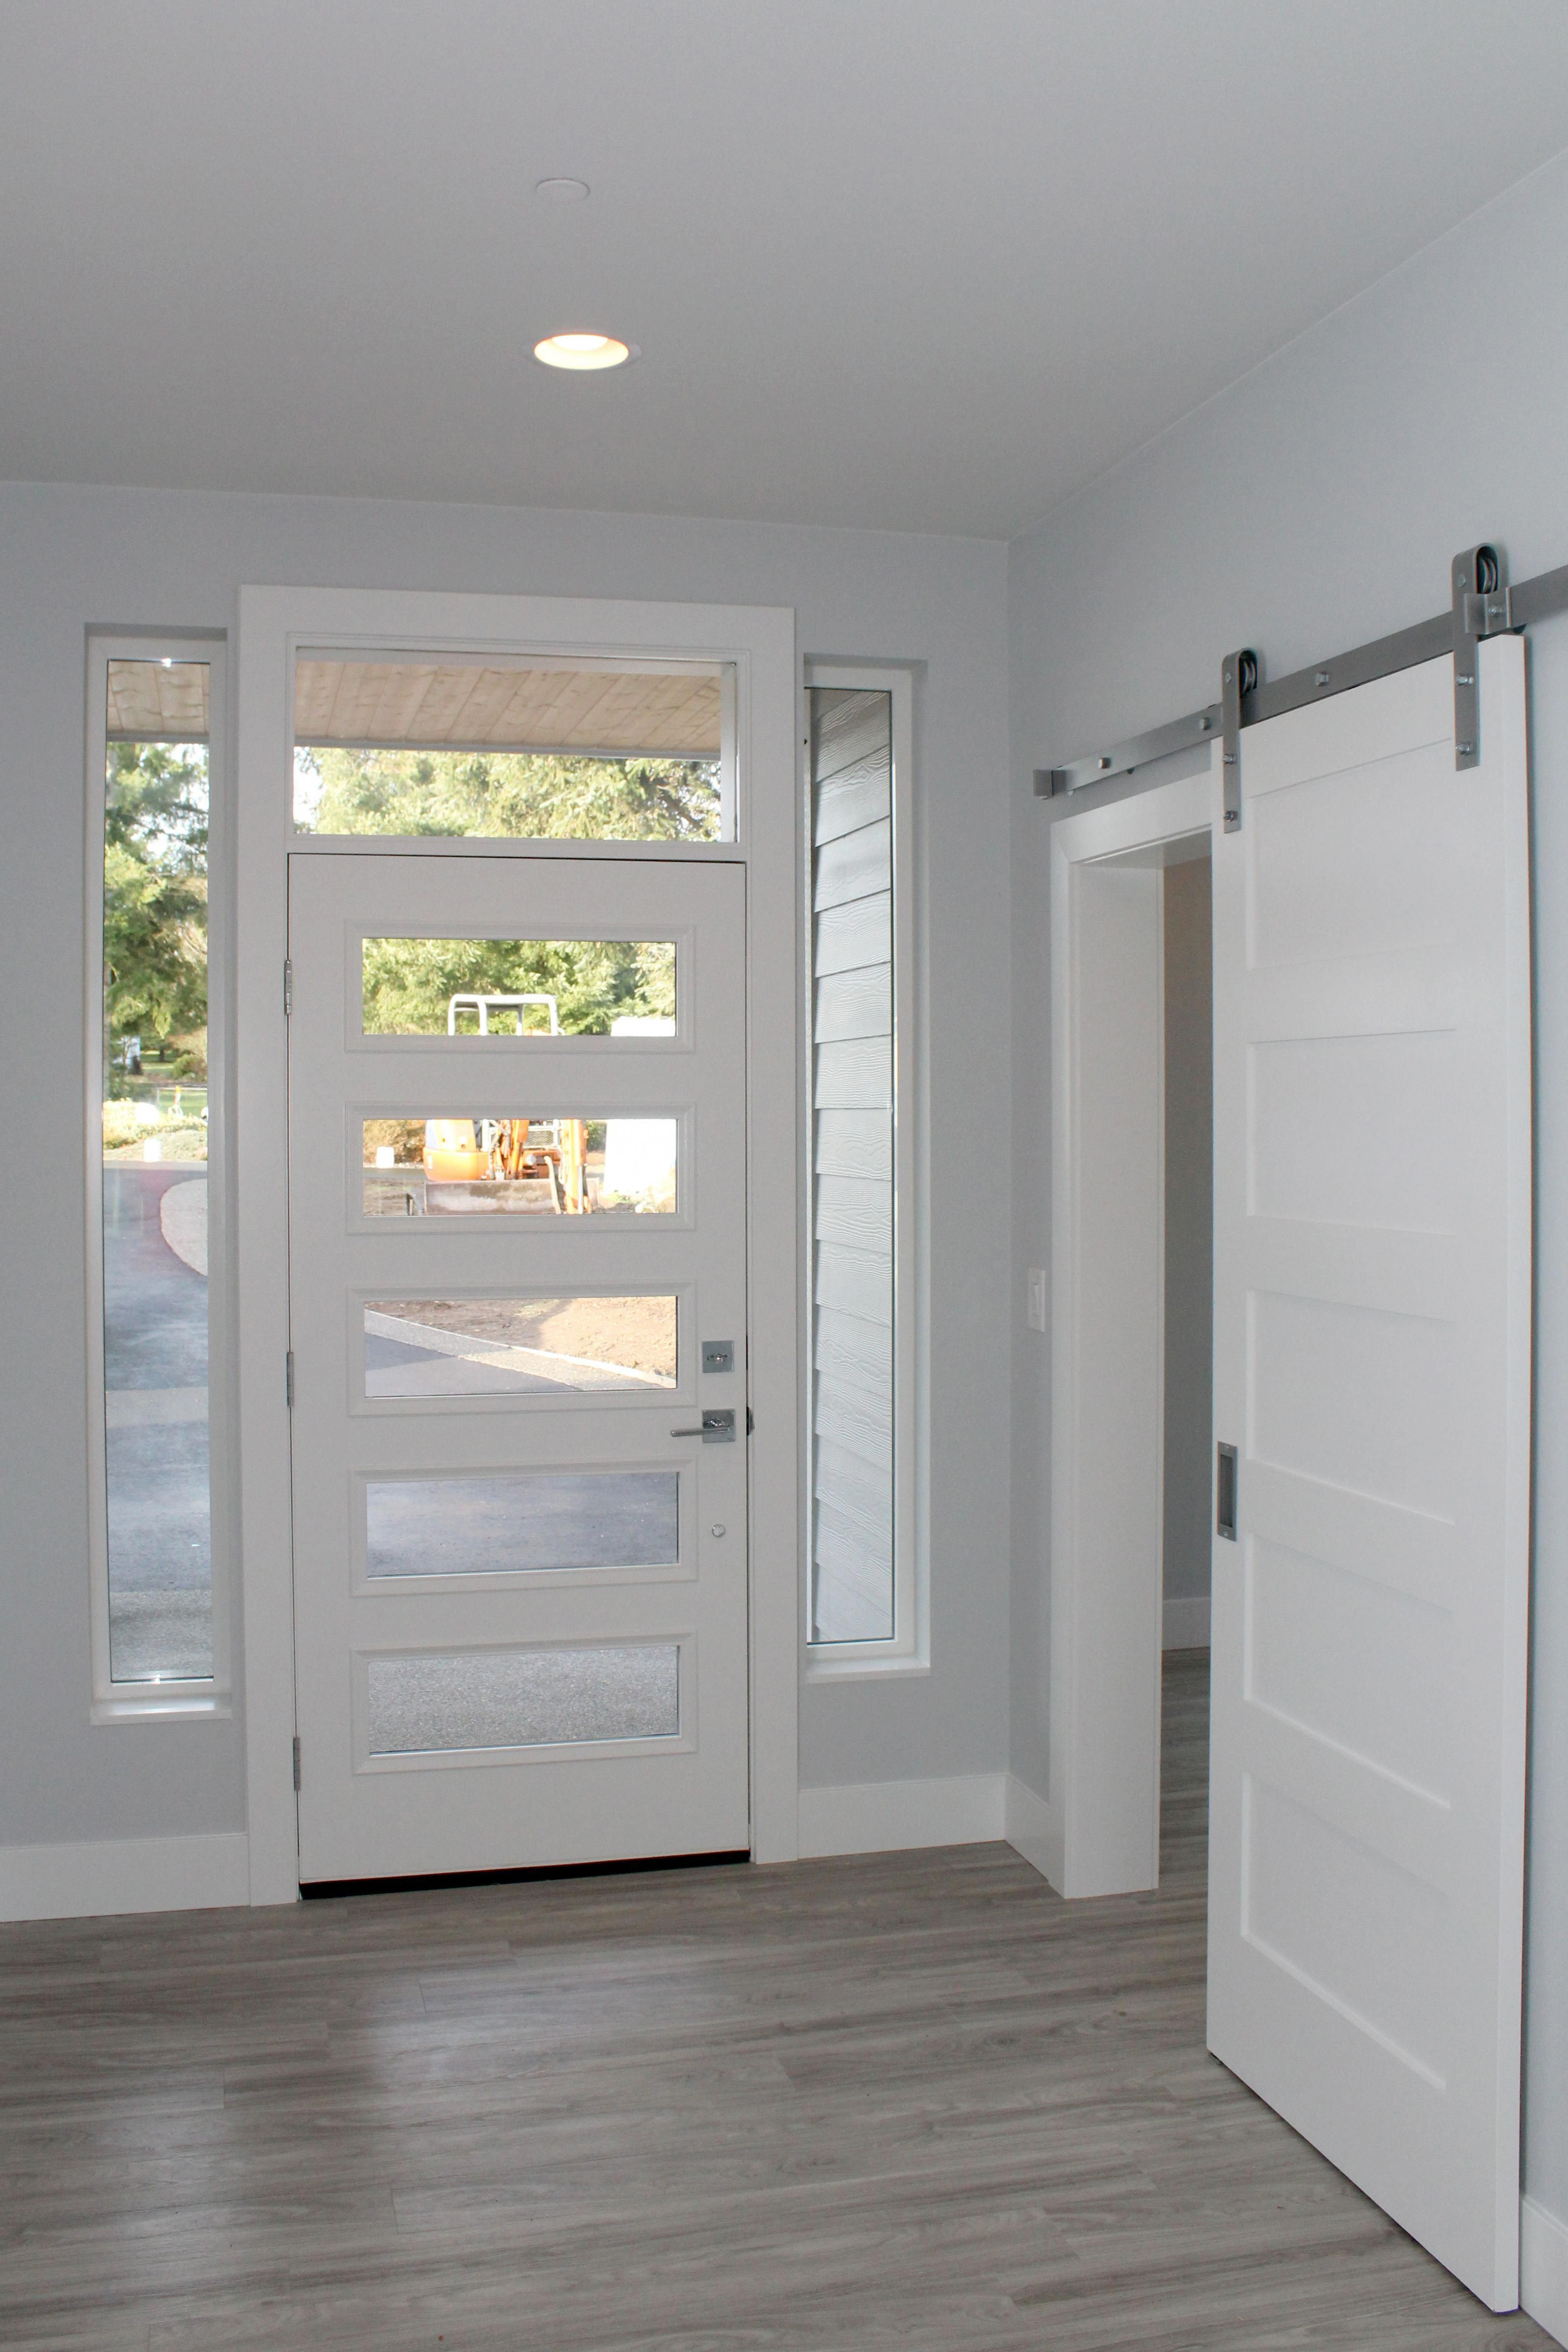 Entry Door Coded 2585 With Sidelights And Toplight Barn Doors Shaker Panel With Interior Barn Door Hardware Interior Sliding Barn Doors Inside Barn Doors